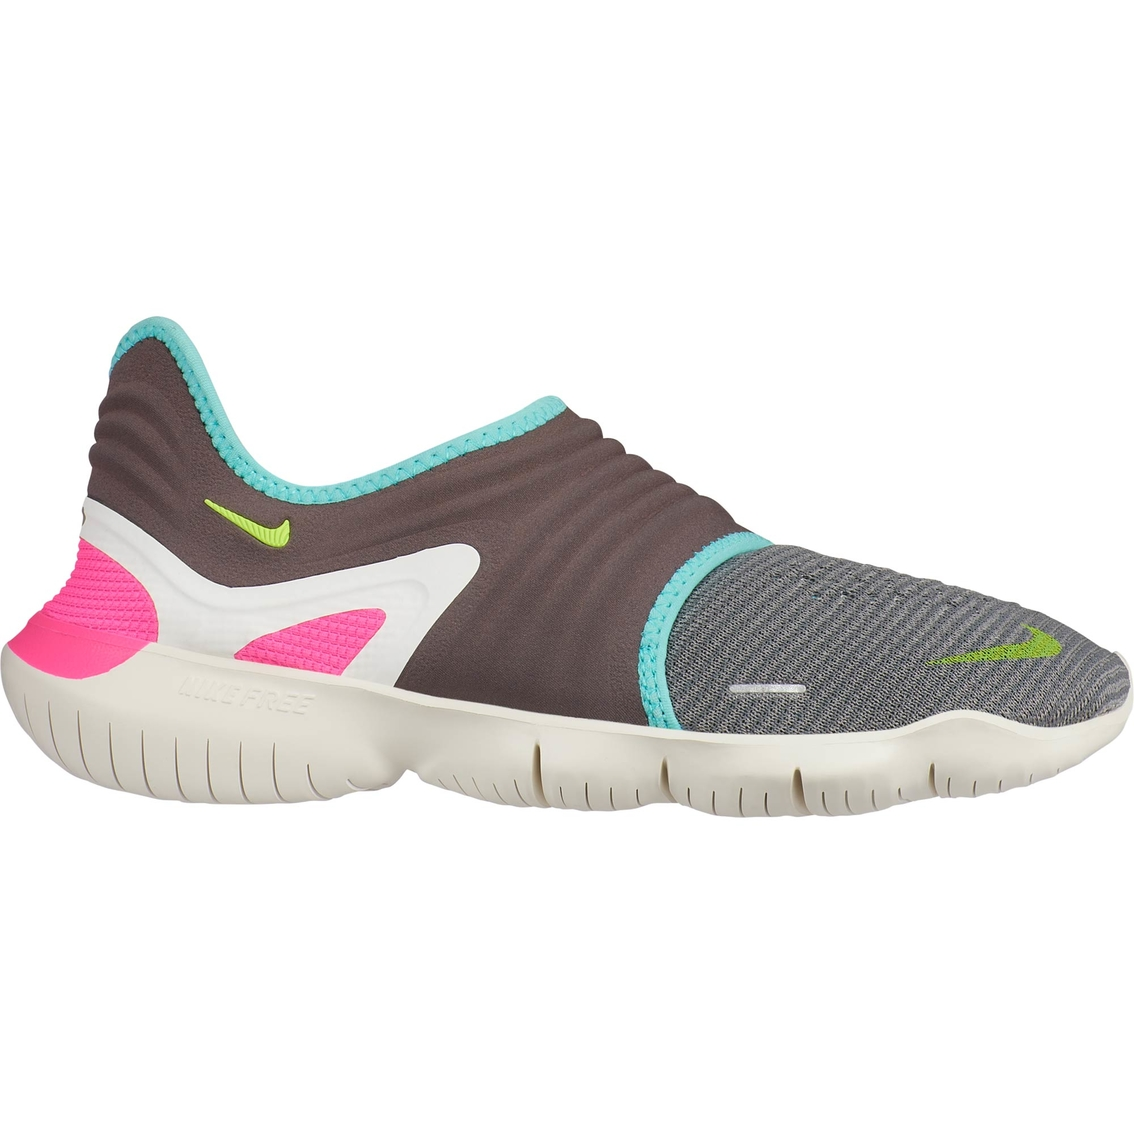 buy online 65fc6 cea0d Nike Women's Free Rn Flyknit 3.0 Running Shoes | Running ...